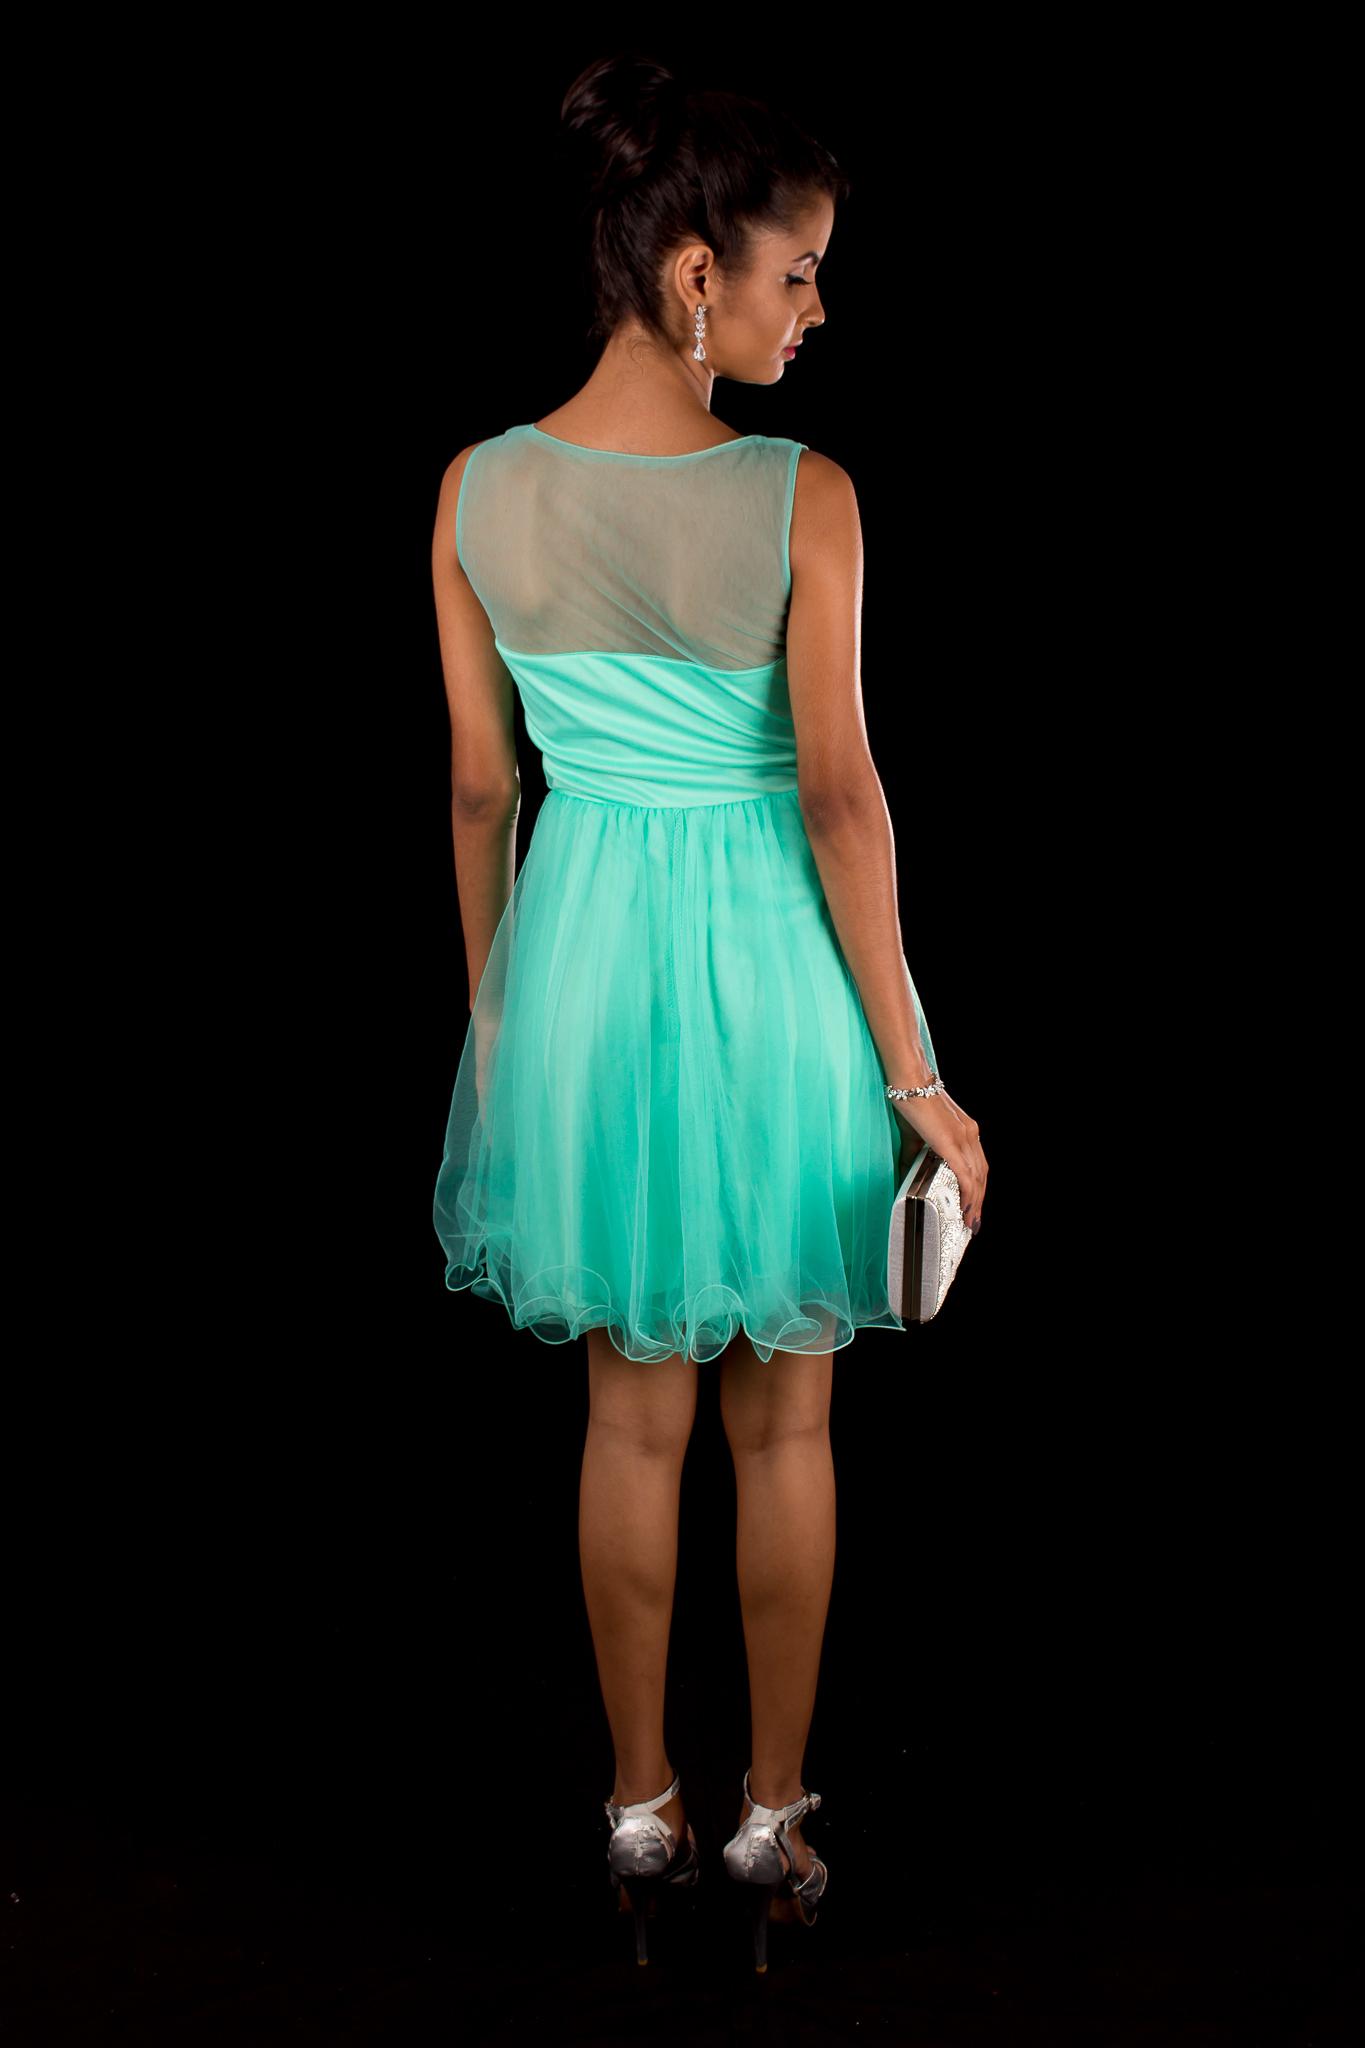 Tiffany in azul - 1 2